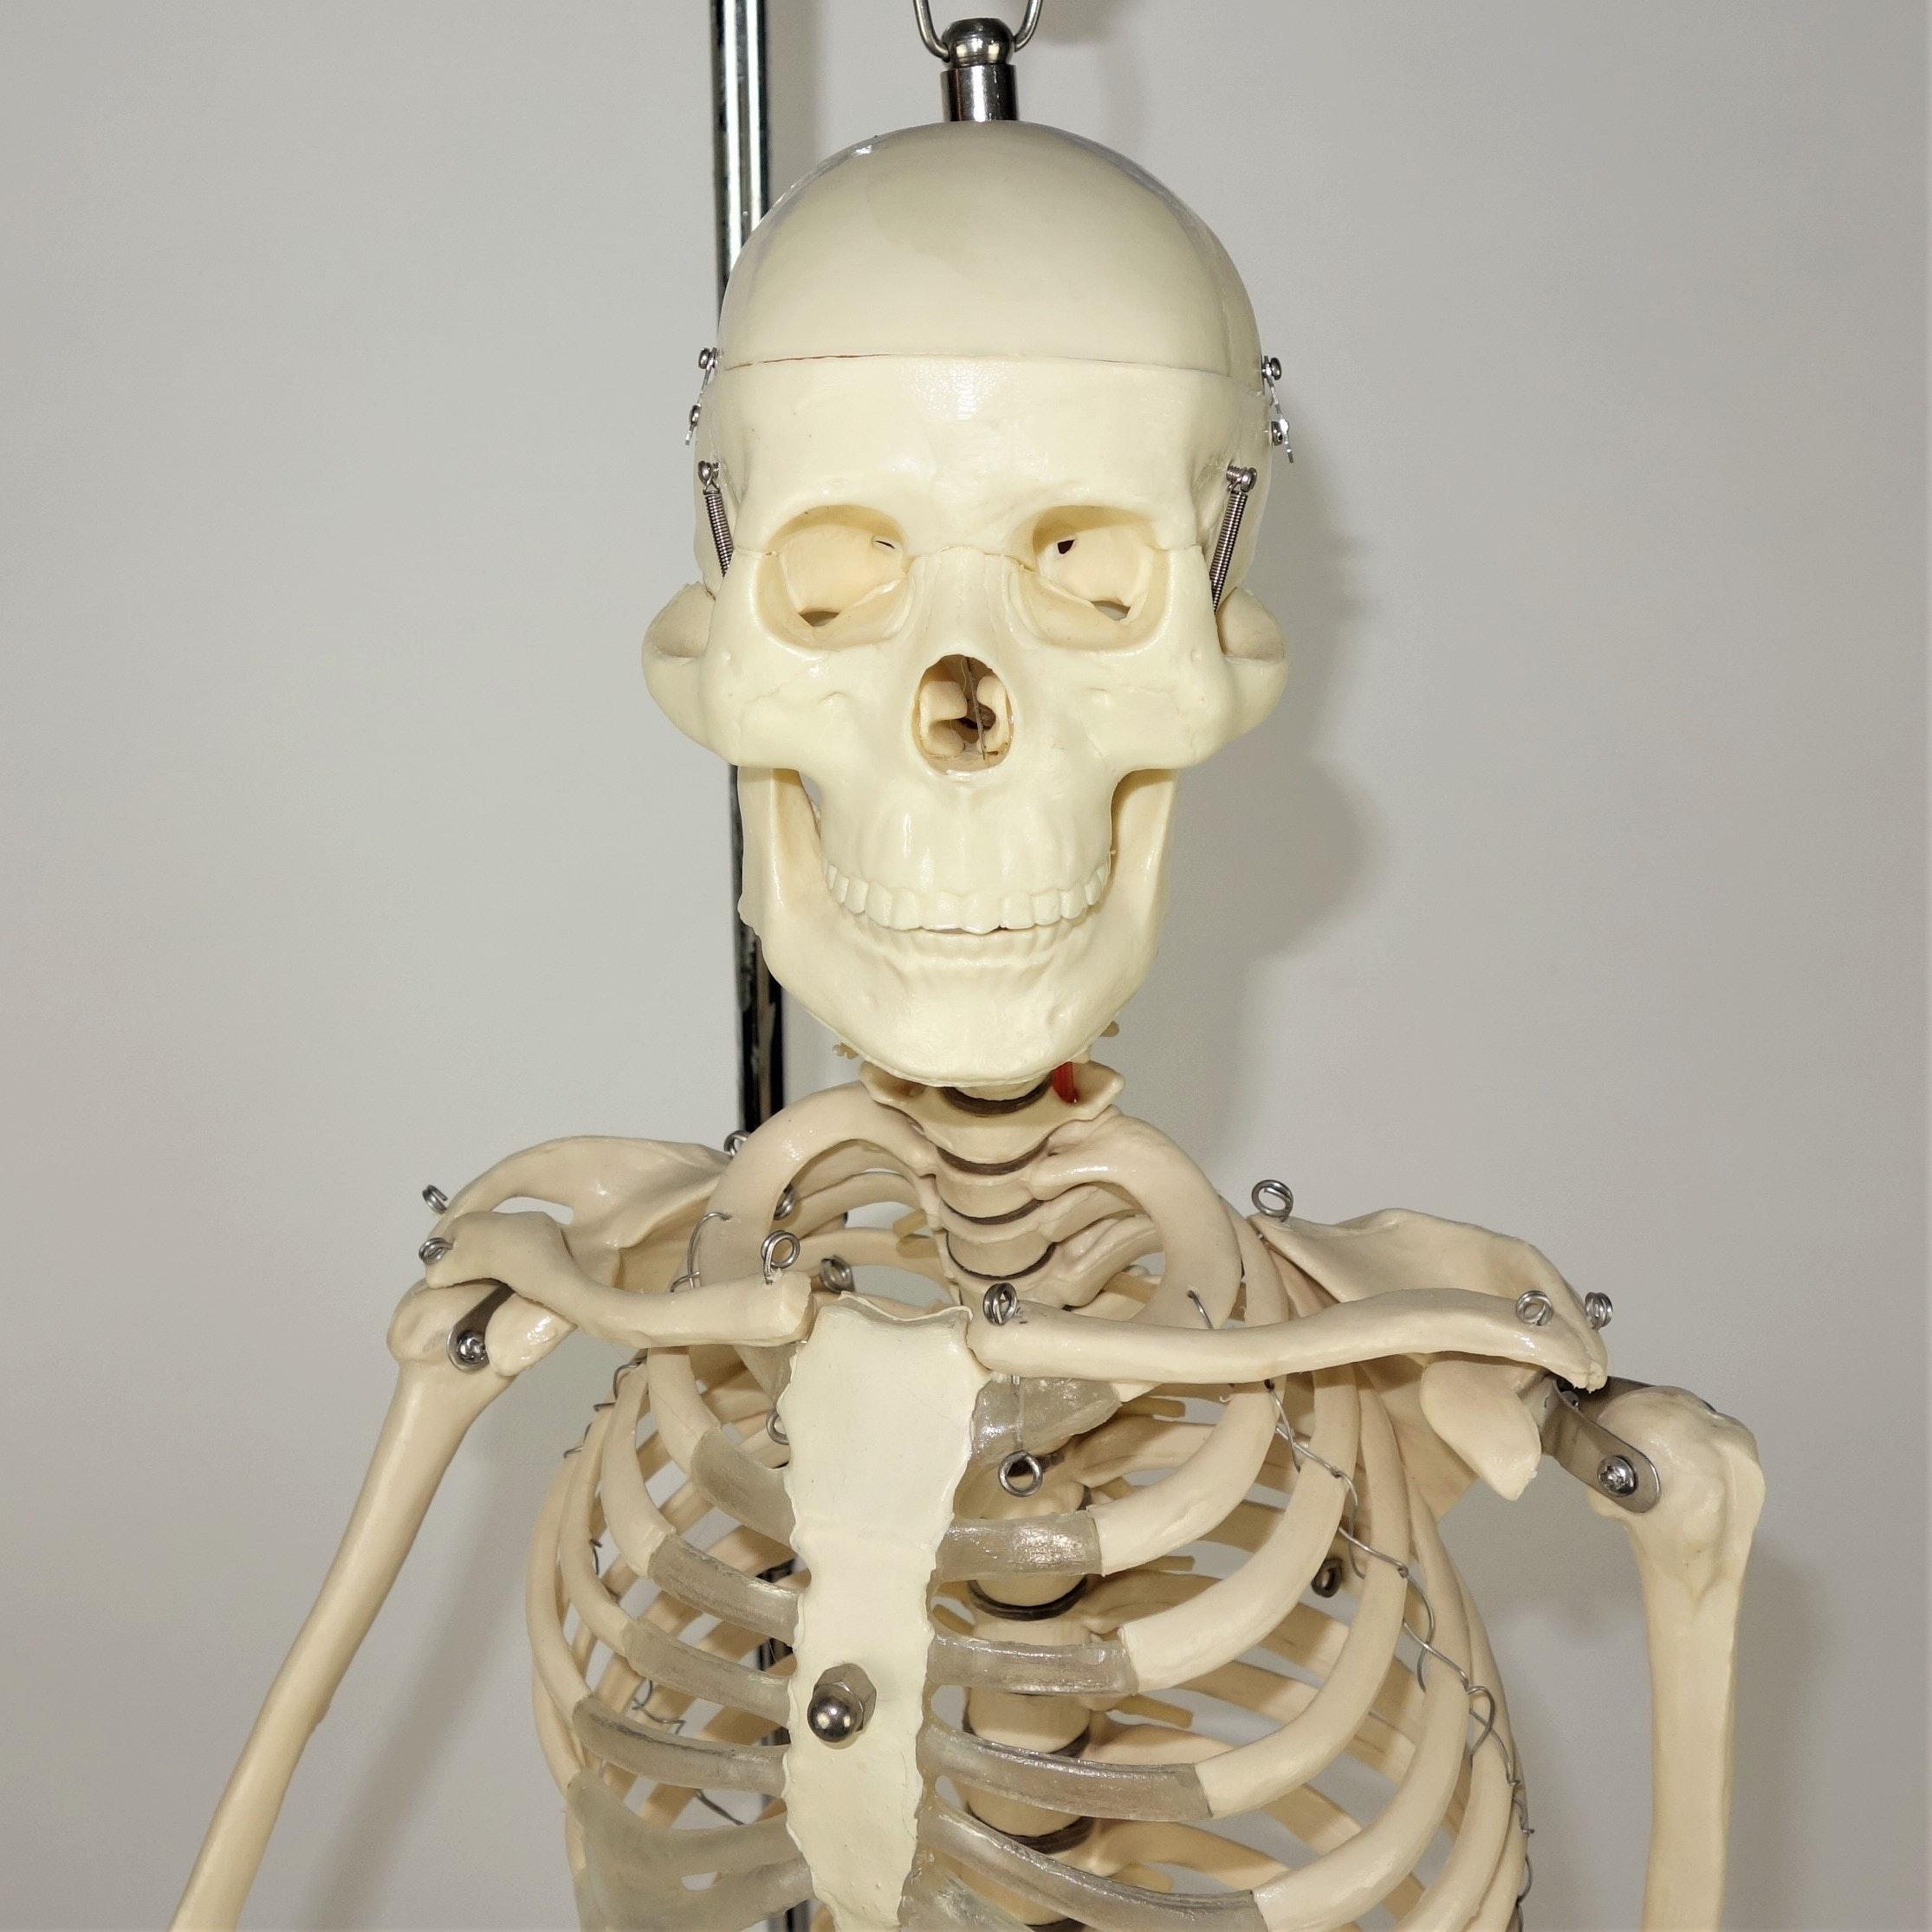 Human Skeleton Model on Stand